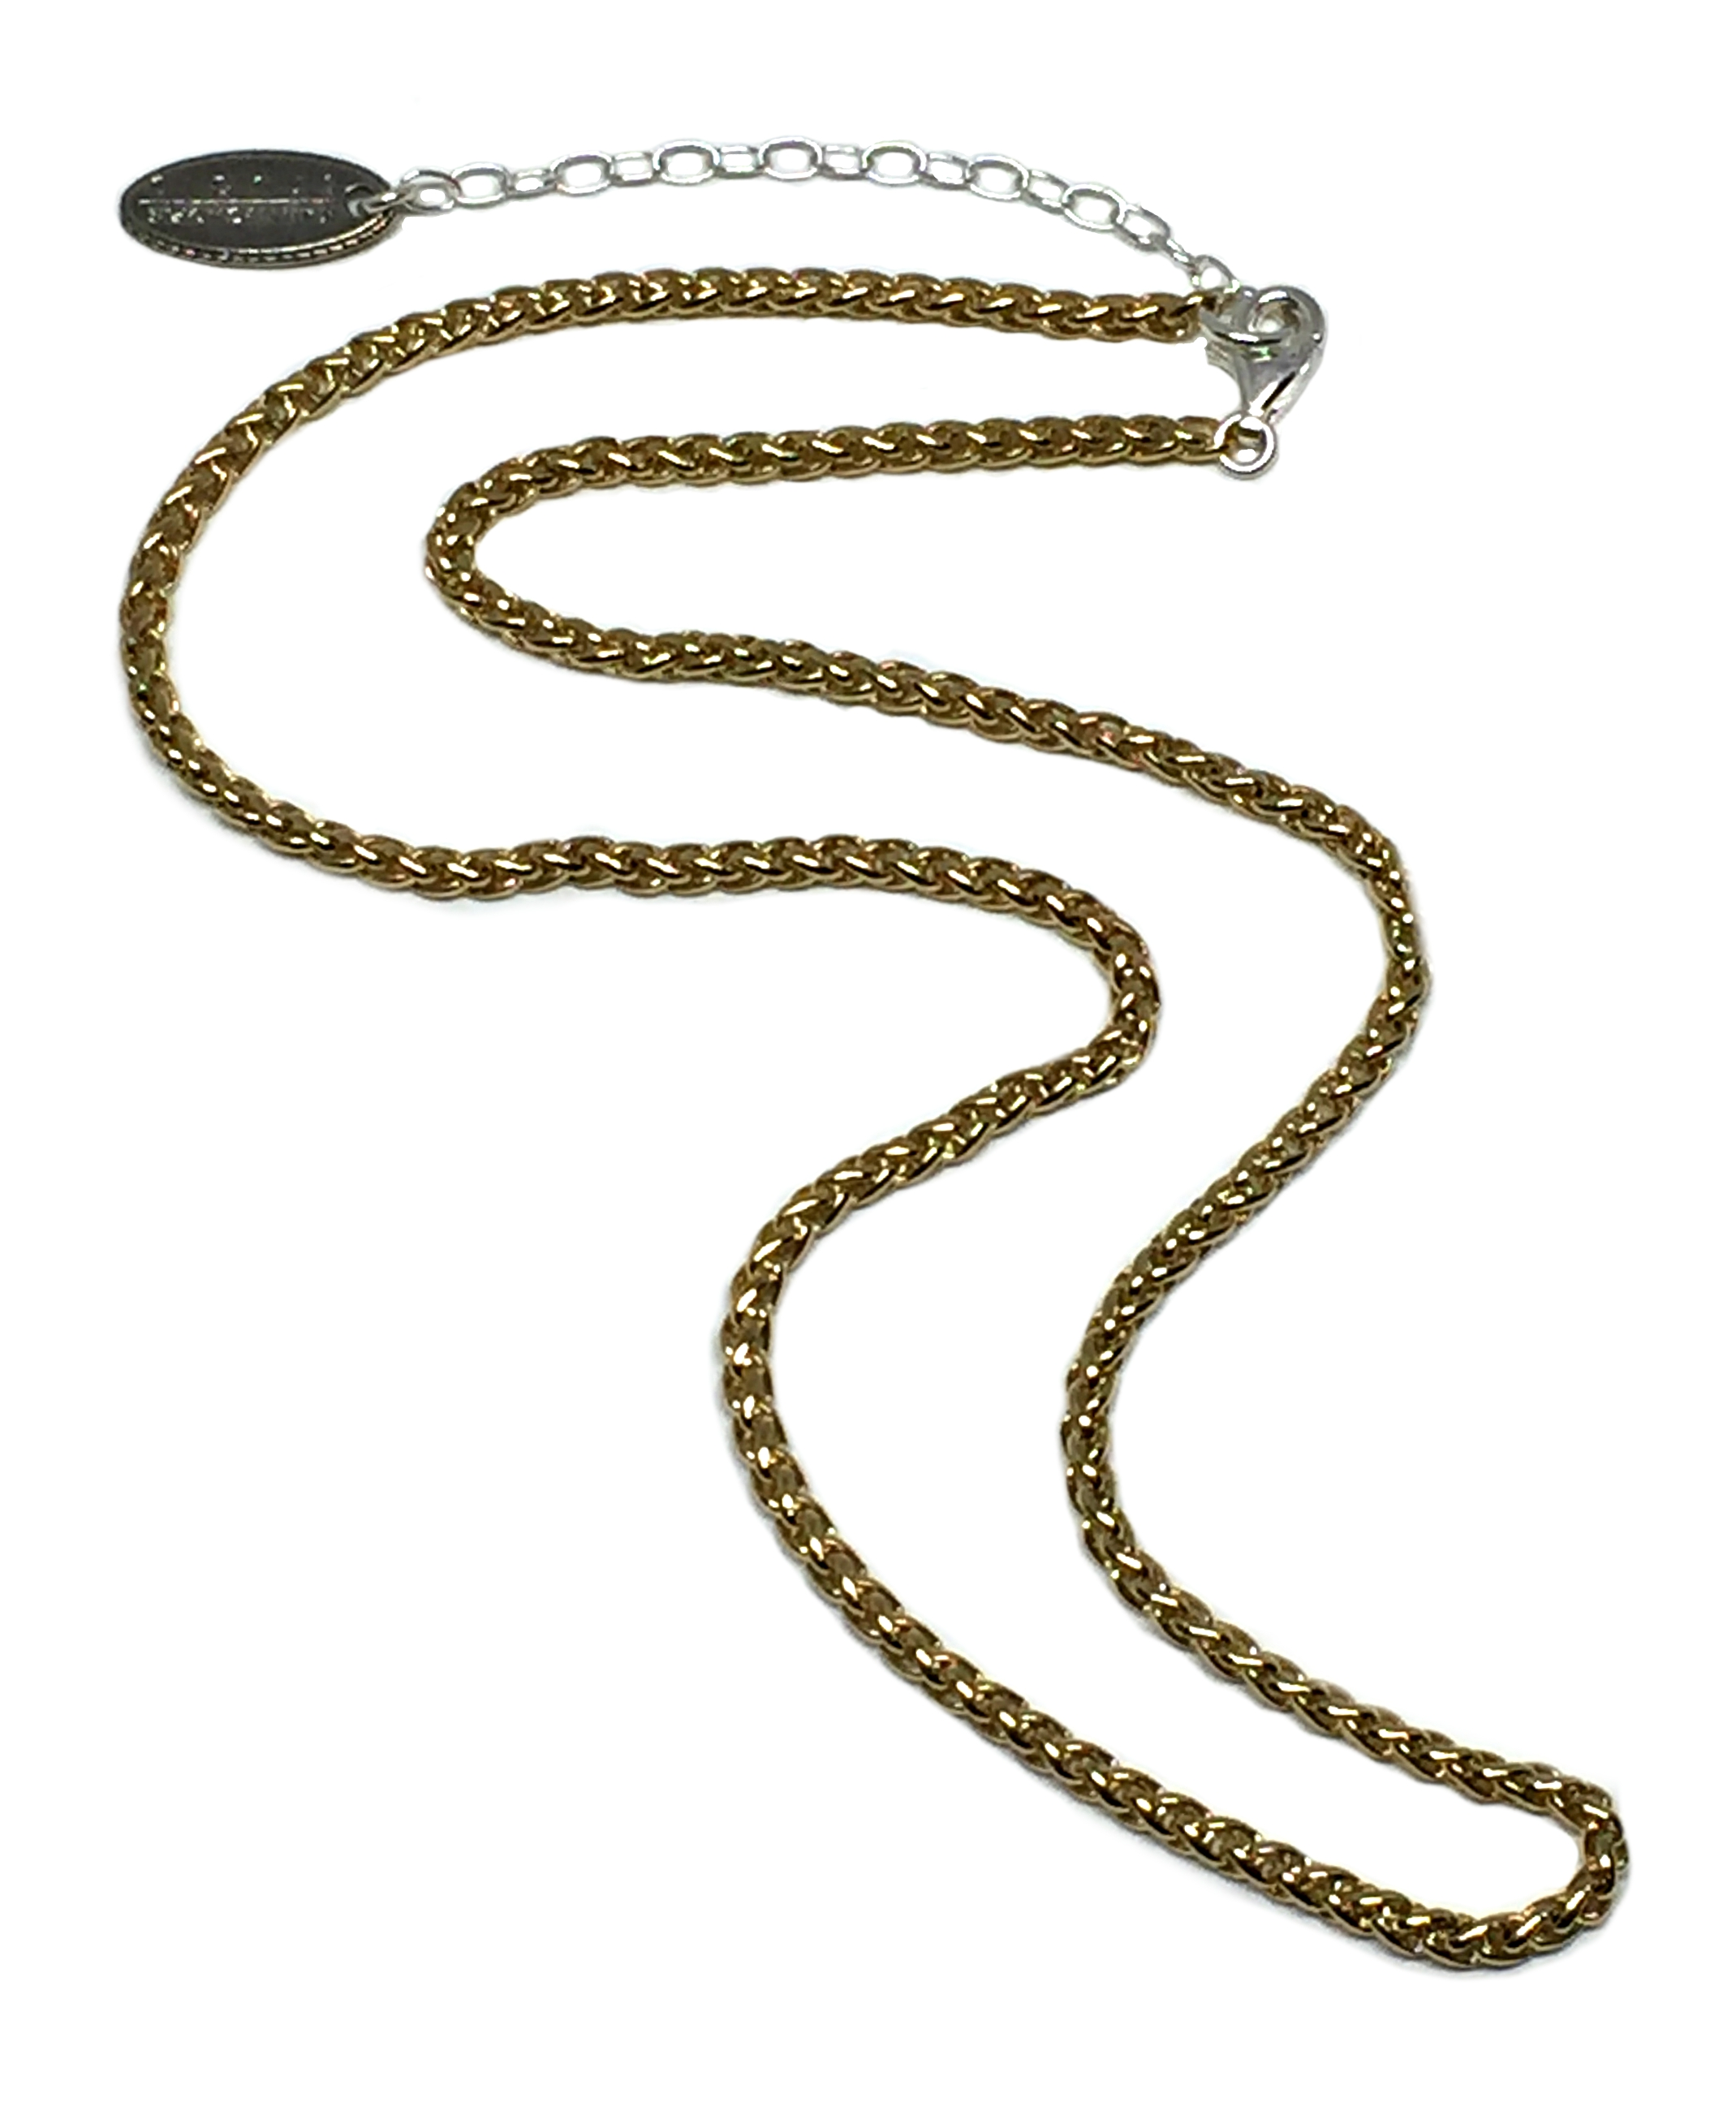 14 karat gold chain by Karyn Chopik | Effusion Art Gallery + Cast Glass Studio, Invermere BC